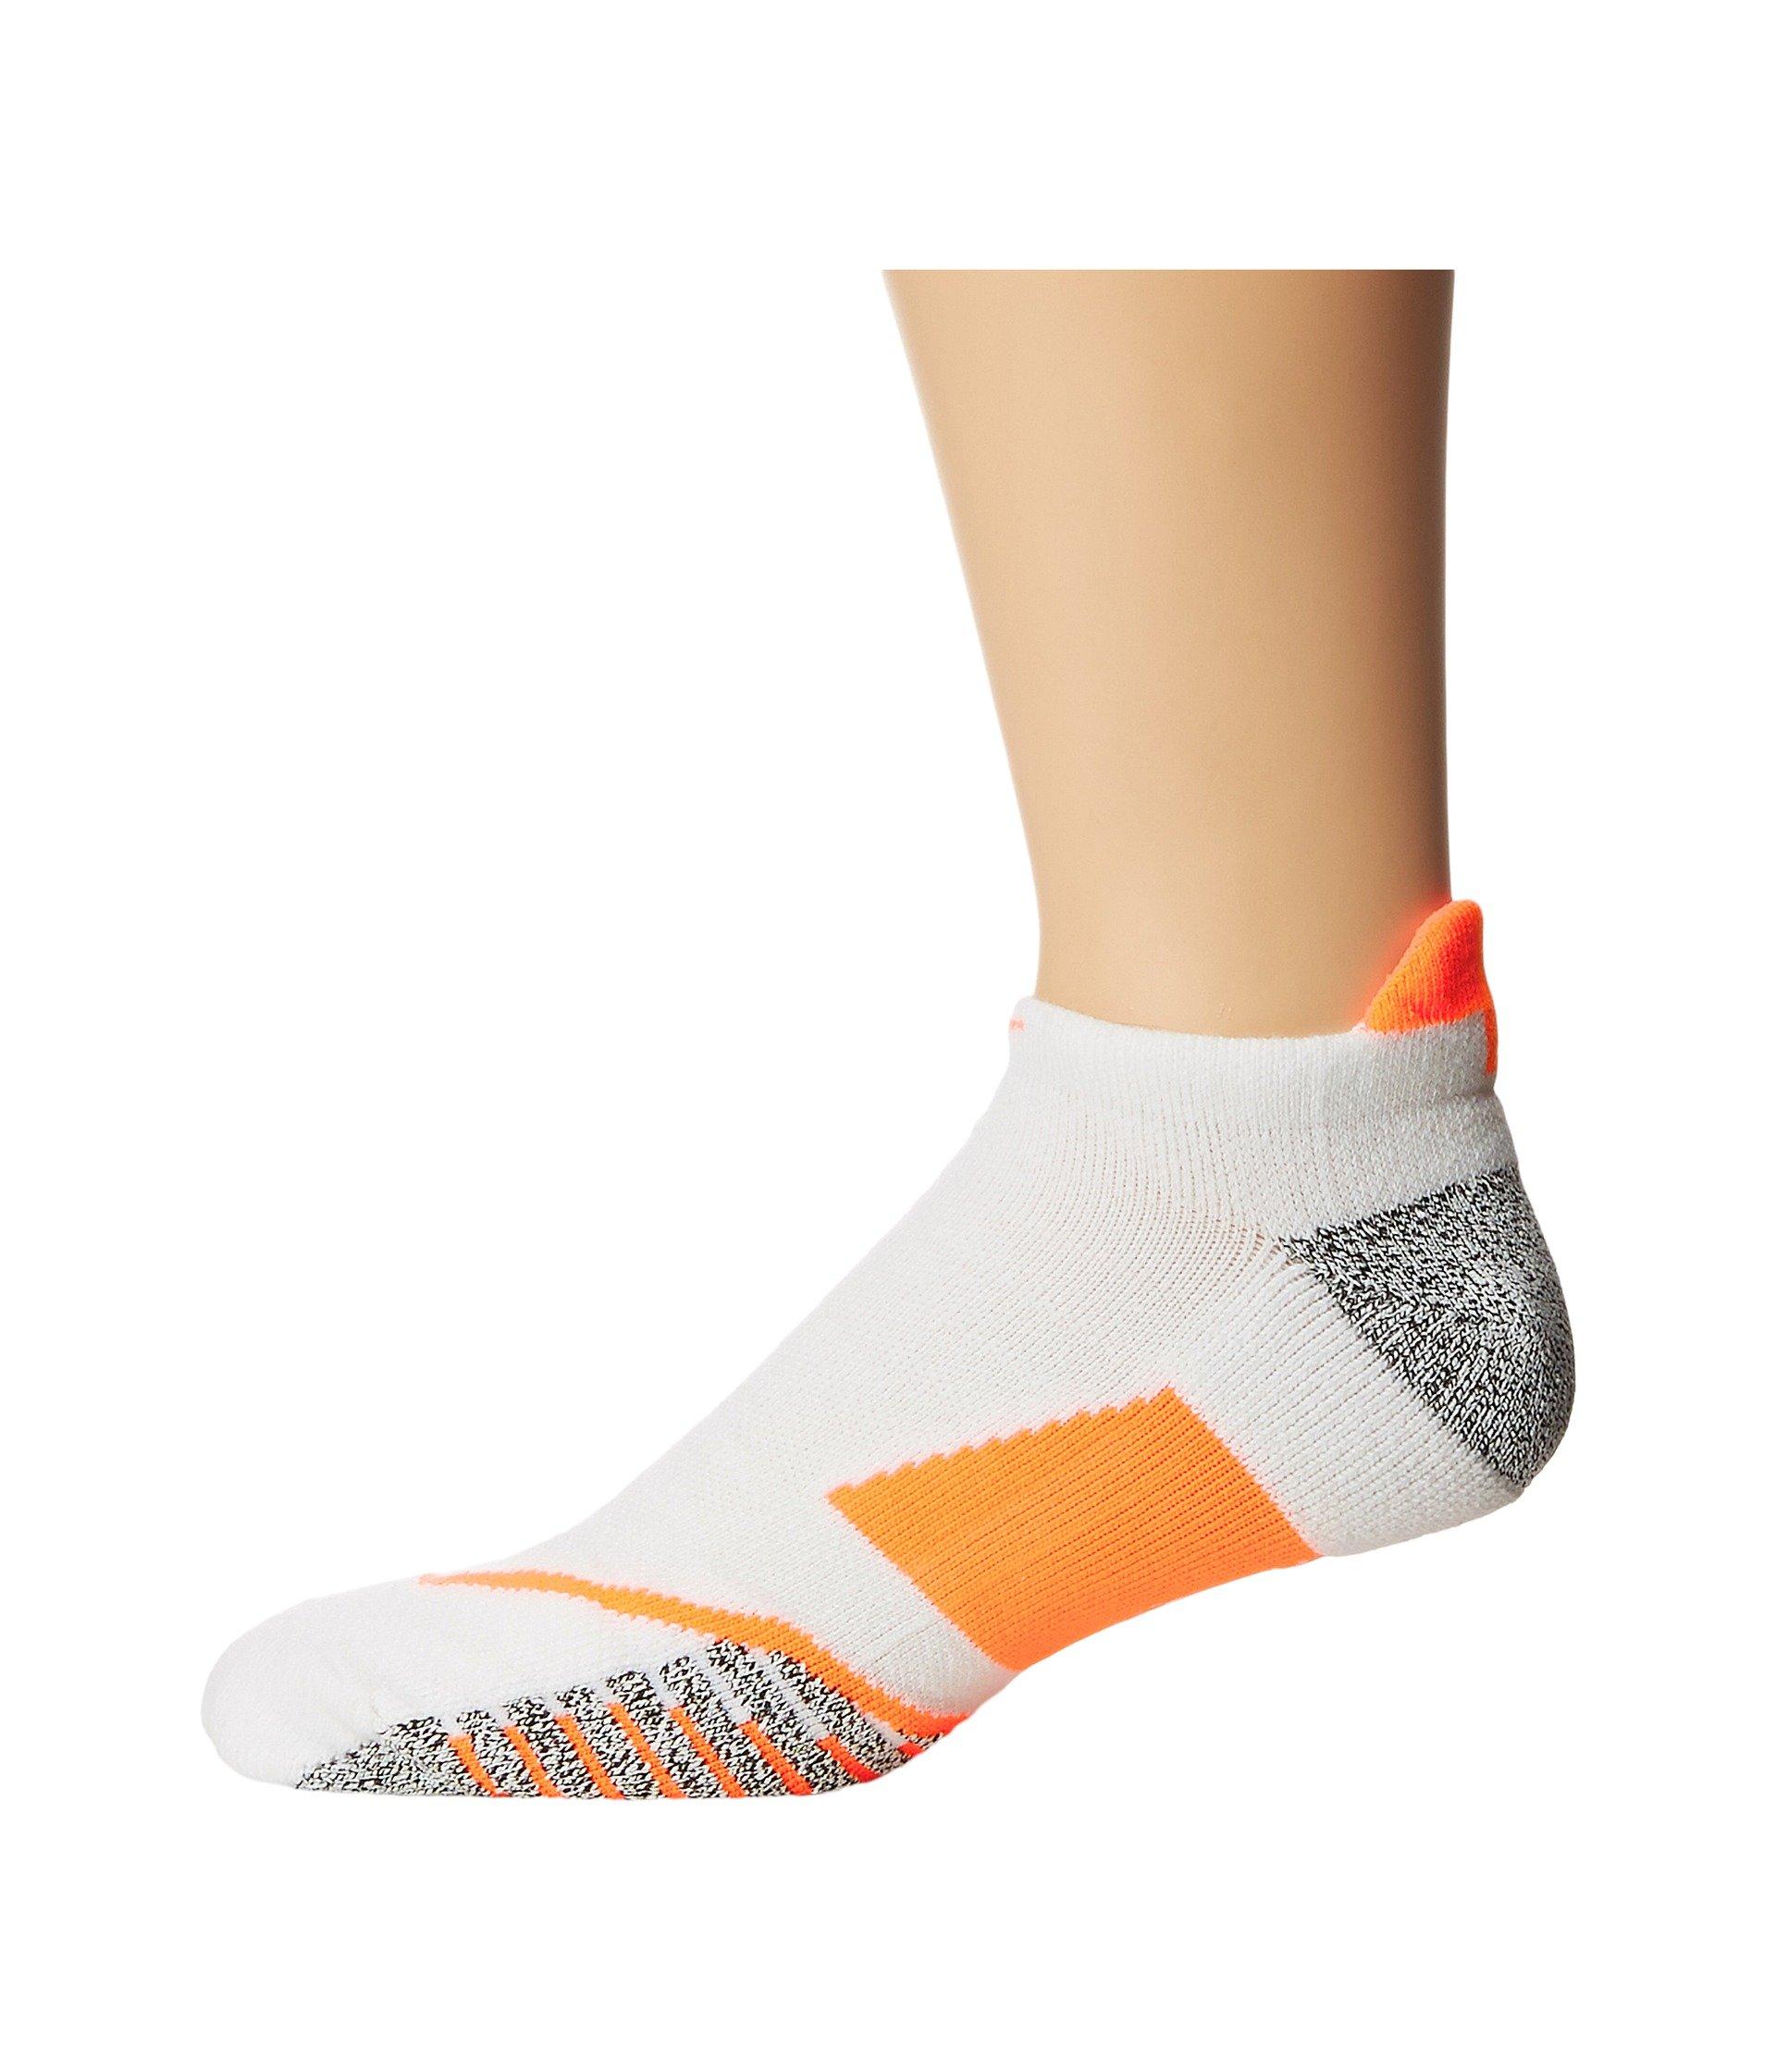 183b85b683fbe Nikegrip Elite No Show Tennis Socks, White/Hyper Orange/Hyper Orange